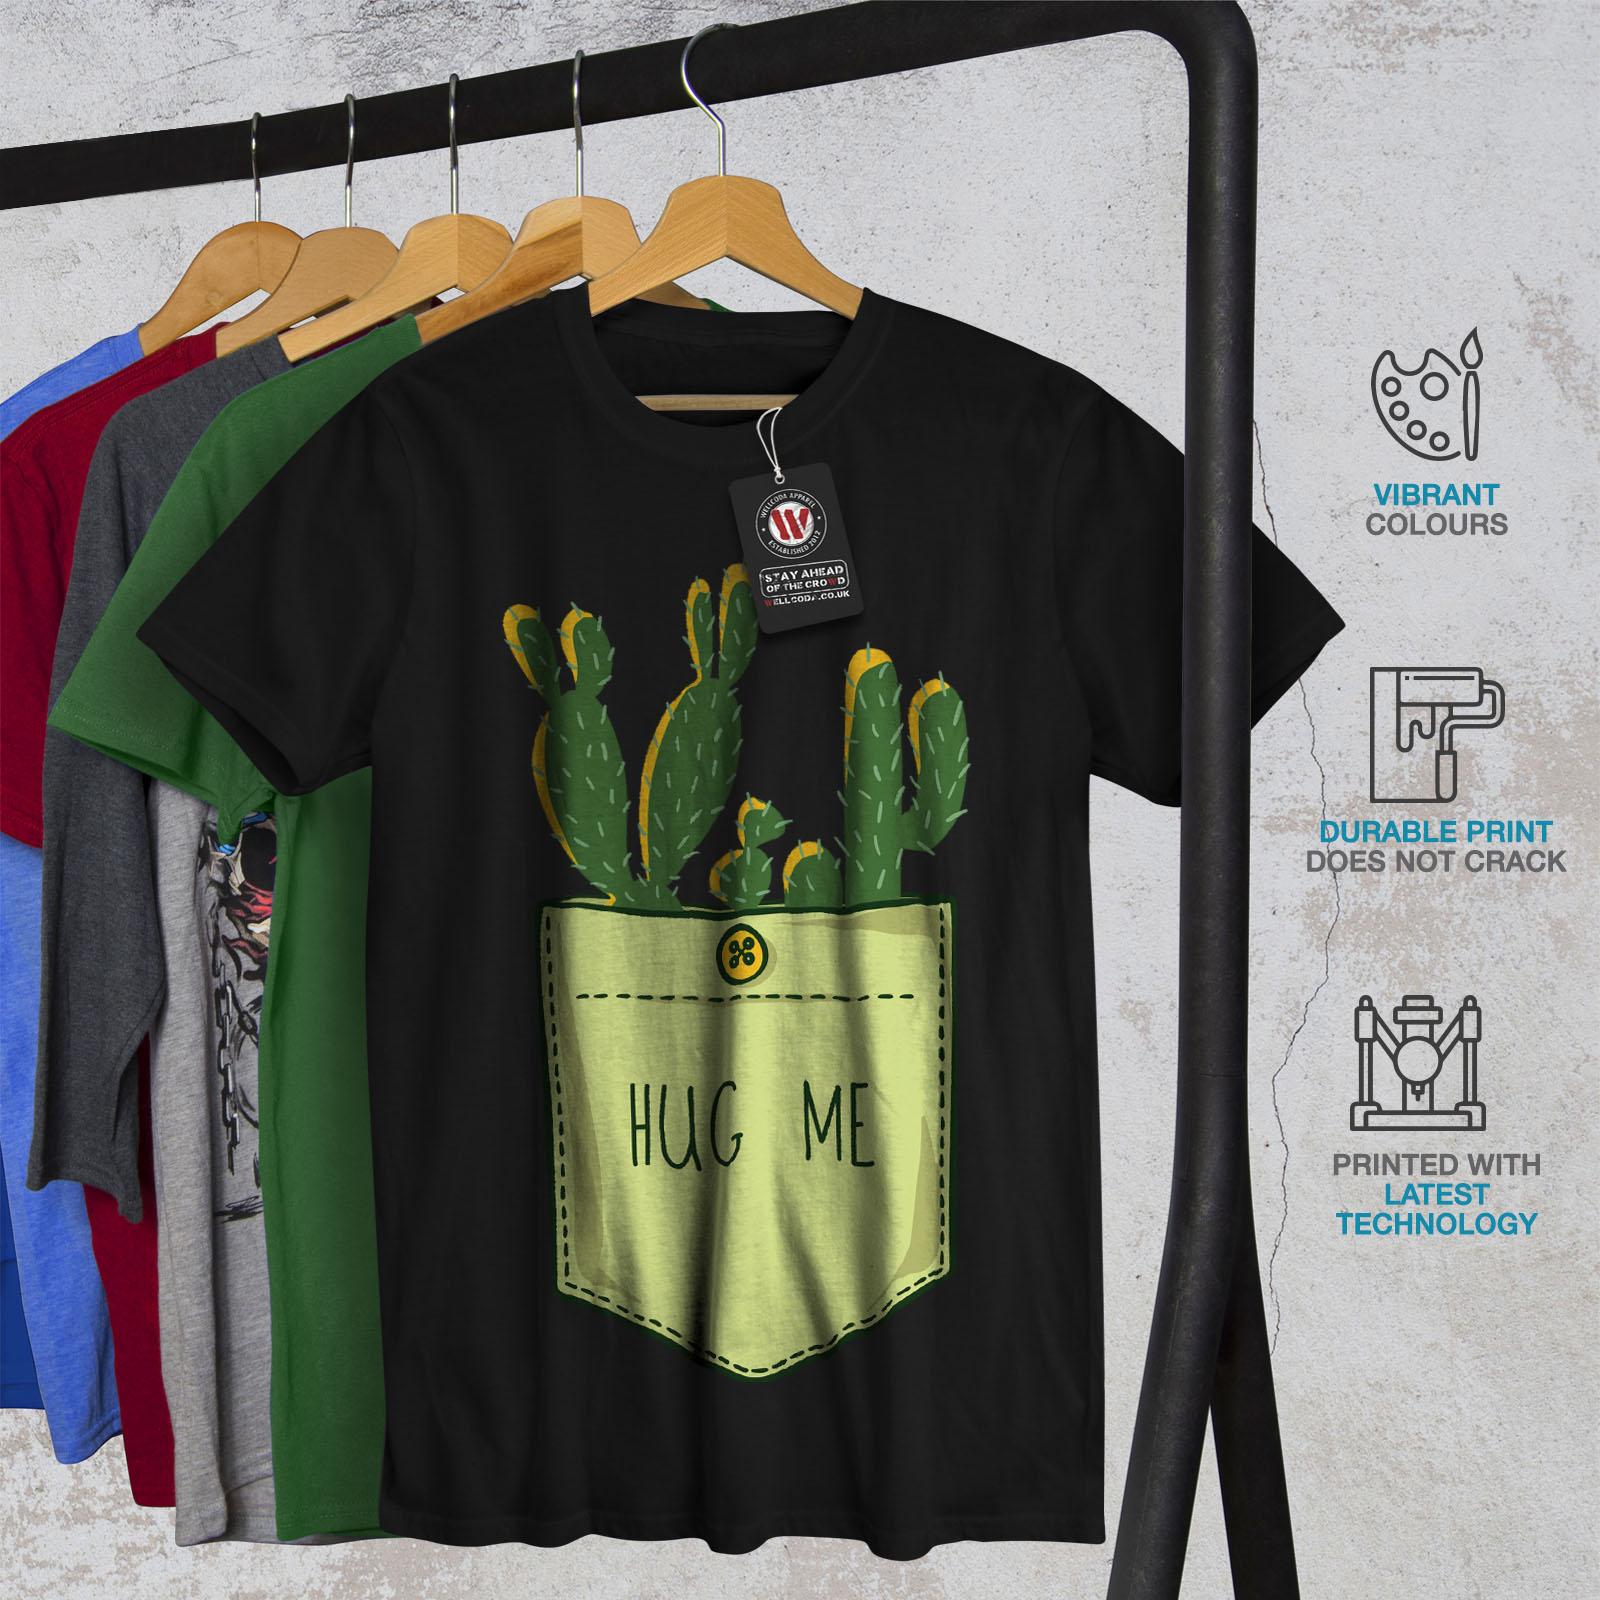 miniature 6 - Wellcoda Hug Me Cactus Funny Mens T-shirt,  Graphic Design Printed Tee